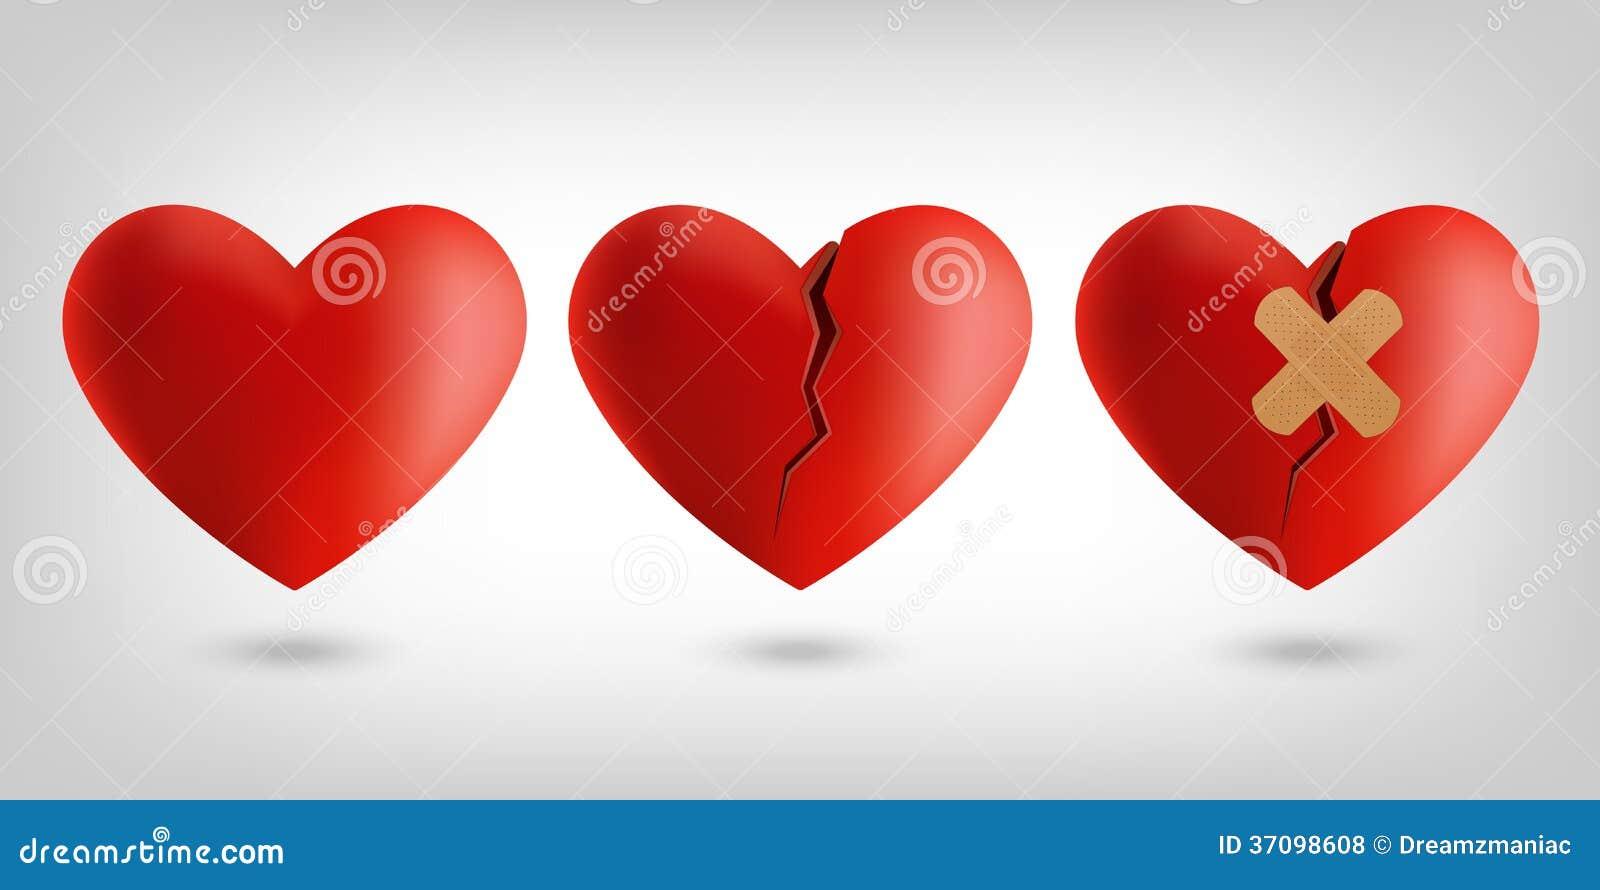 Heart icons stock vector illustration of healing broken 37098608 heart icons buycottarizona